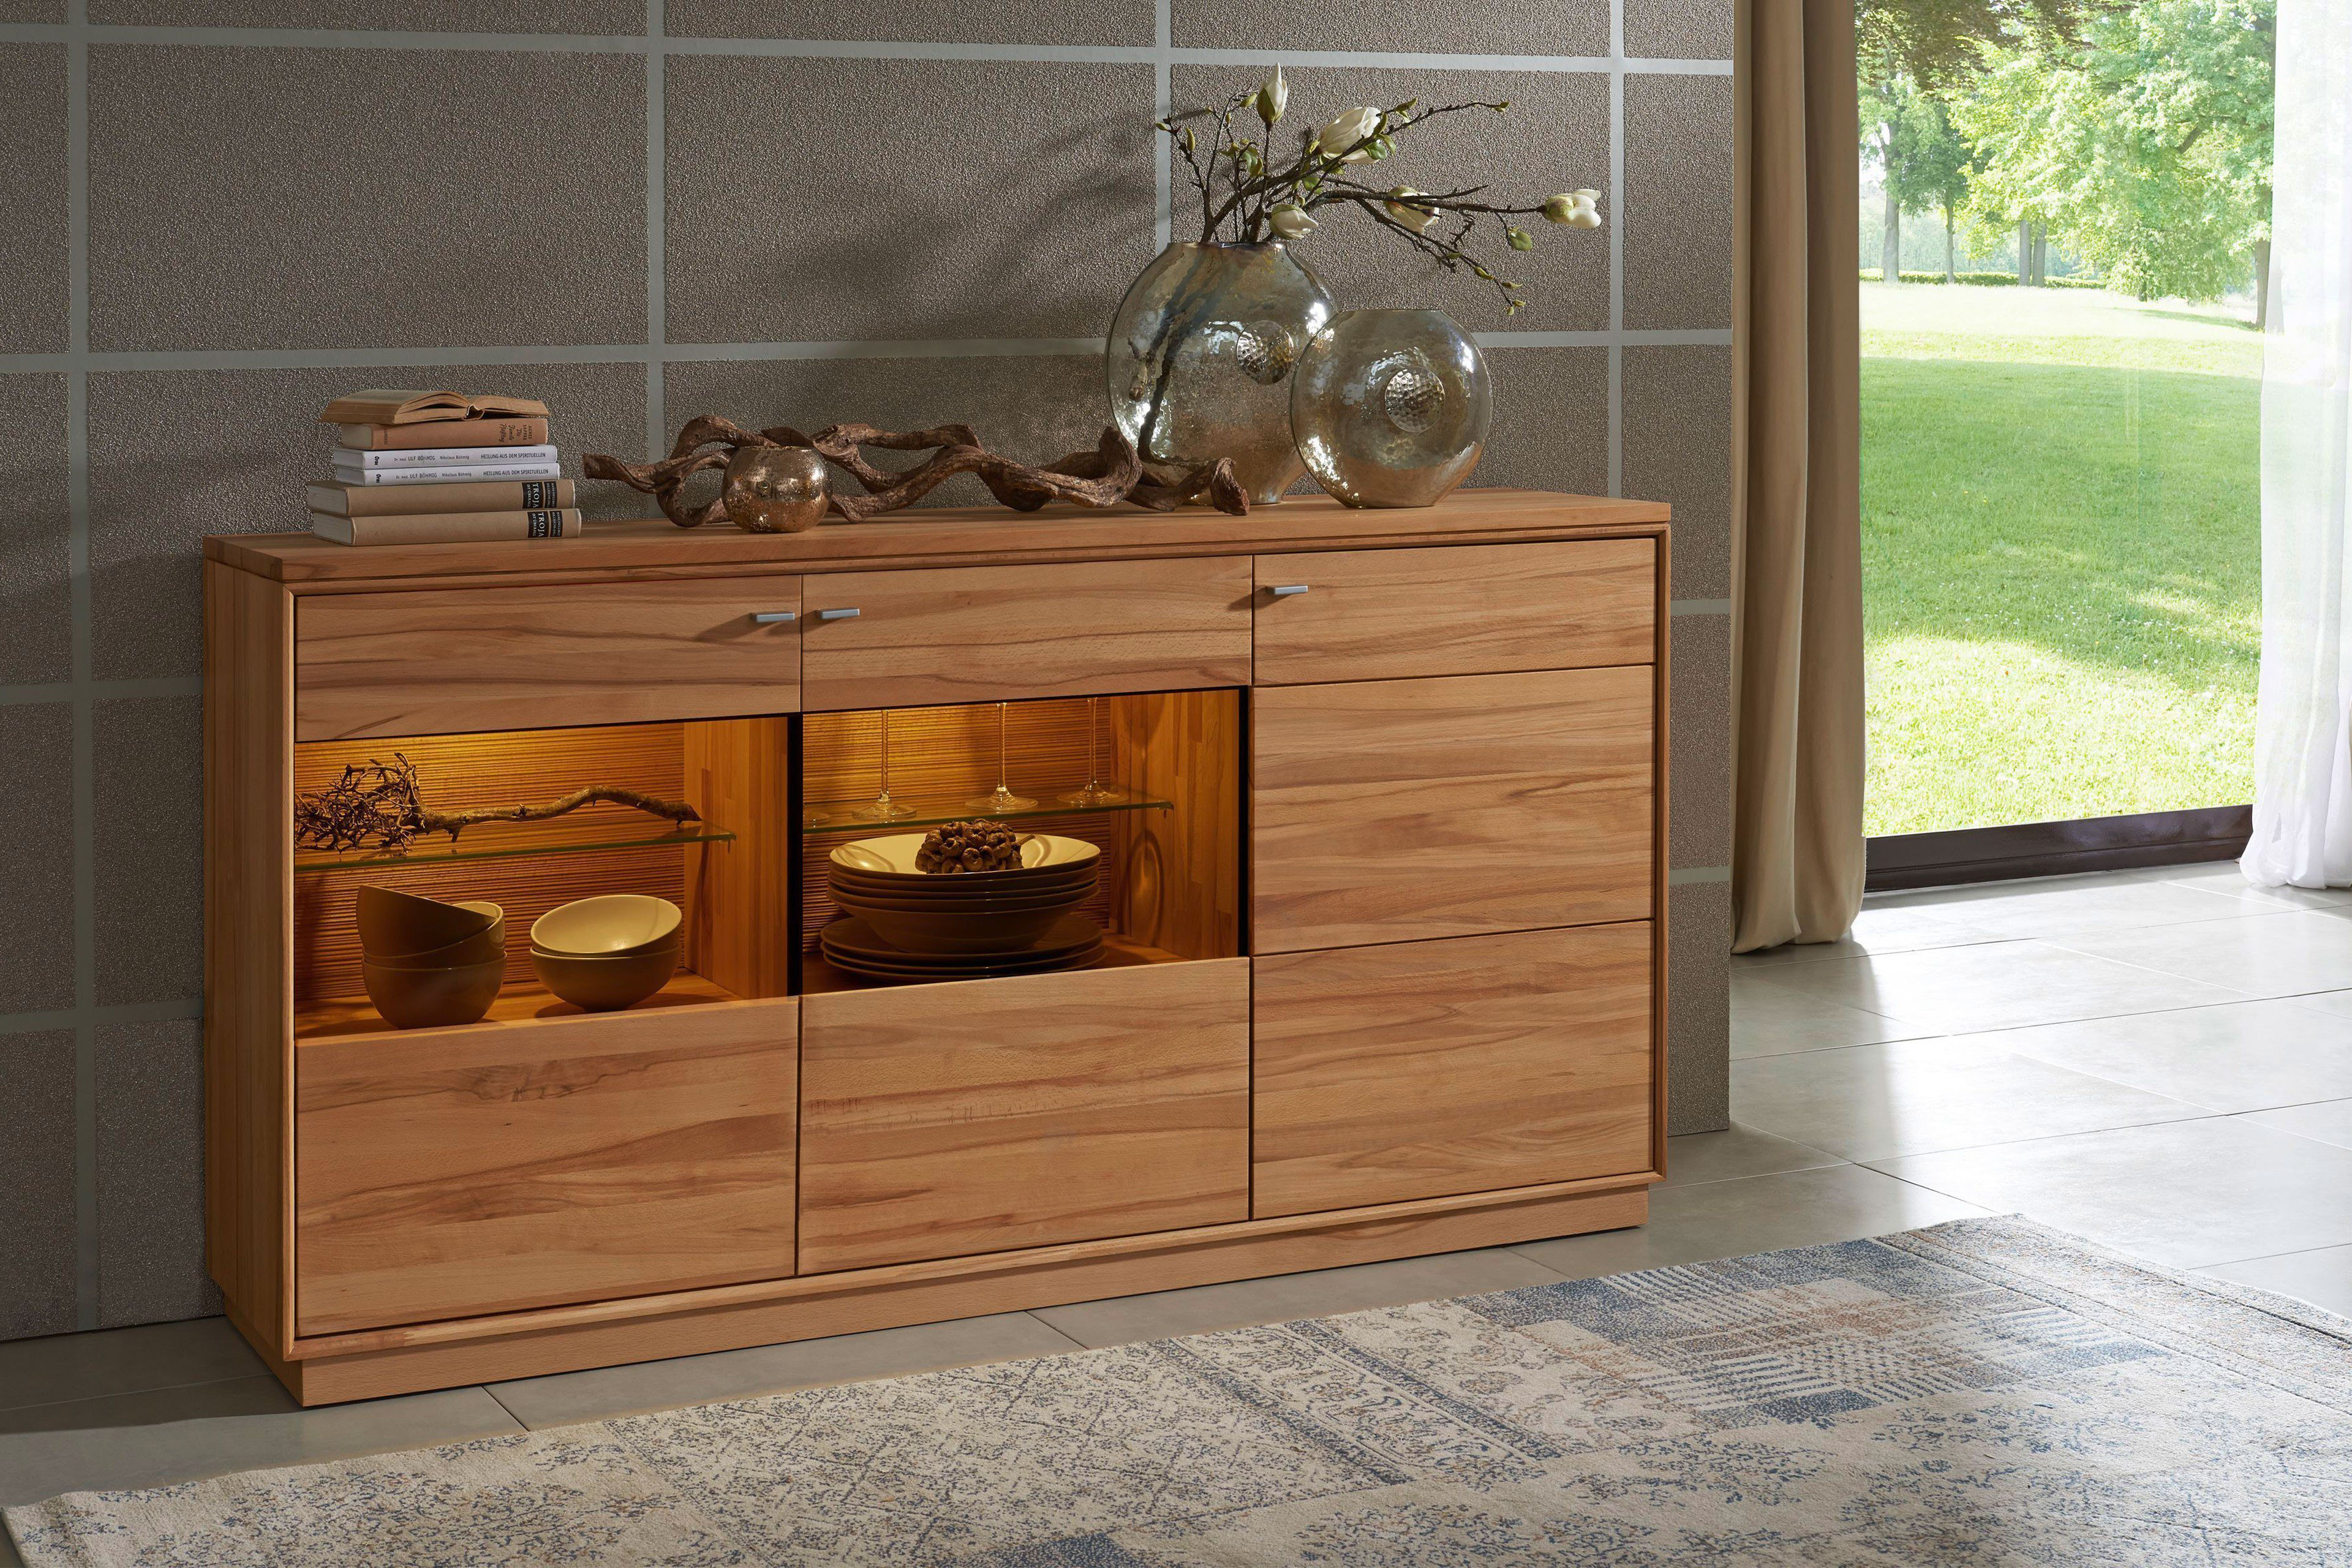 Dudinger Furniture Sideboard Alexandra Ax 2314 Aus Kernbuche Natur